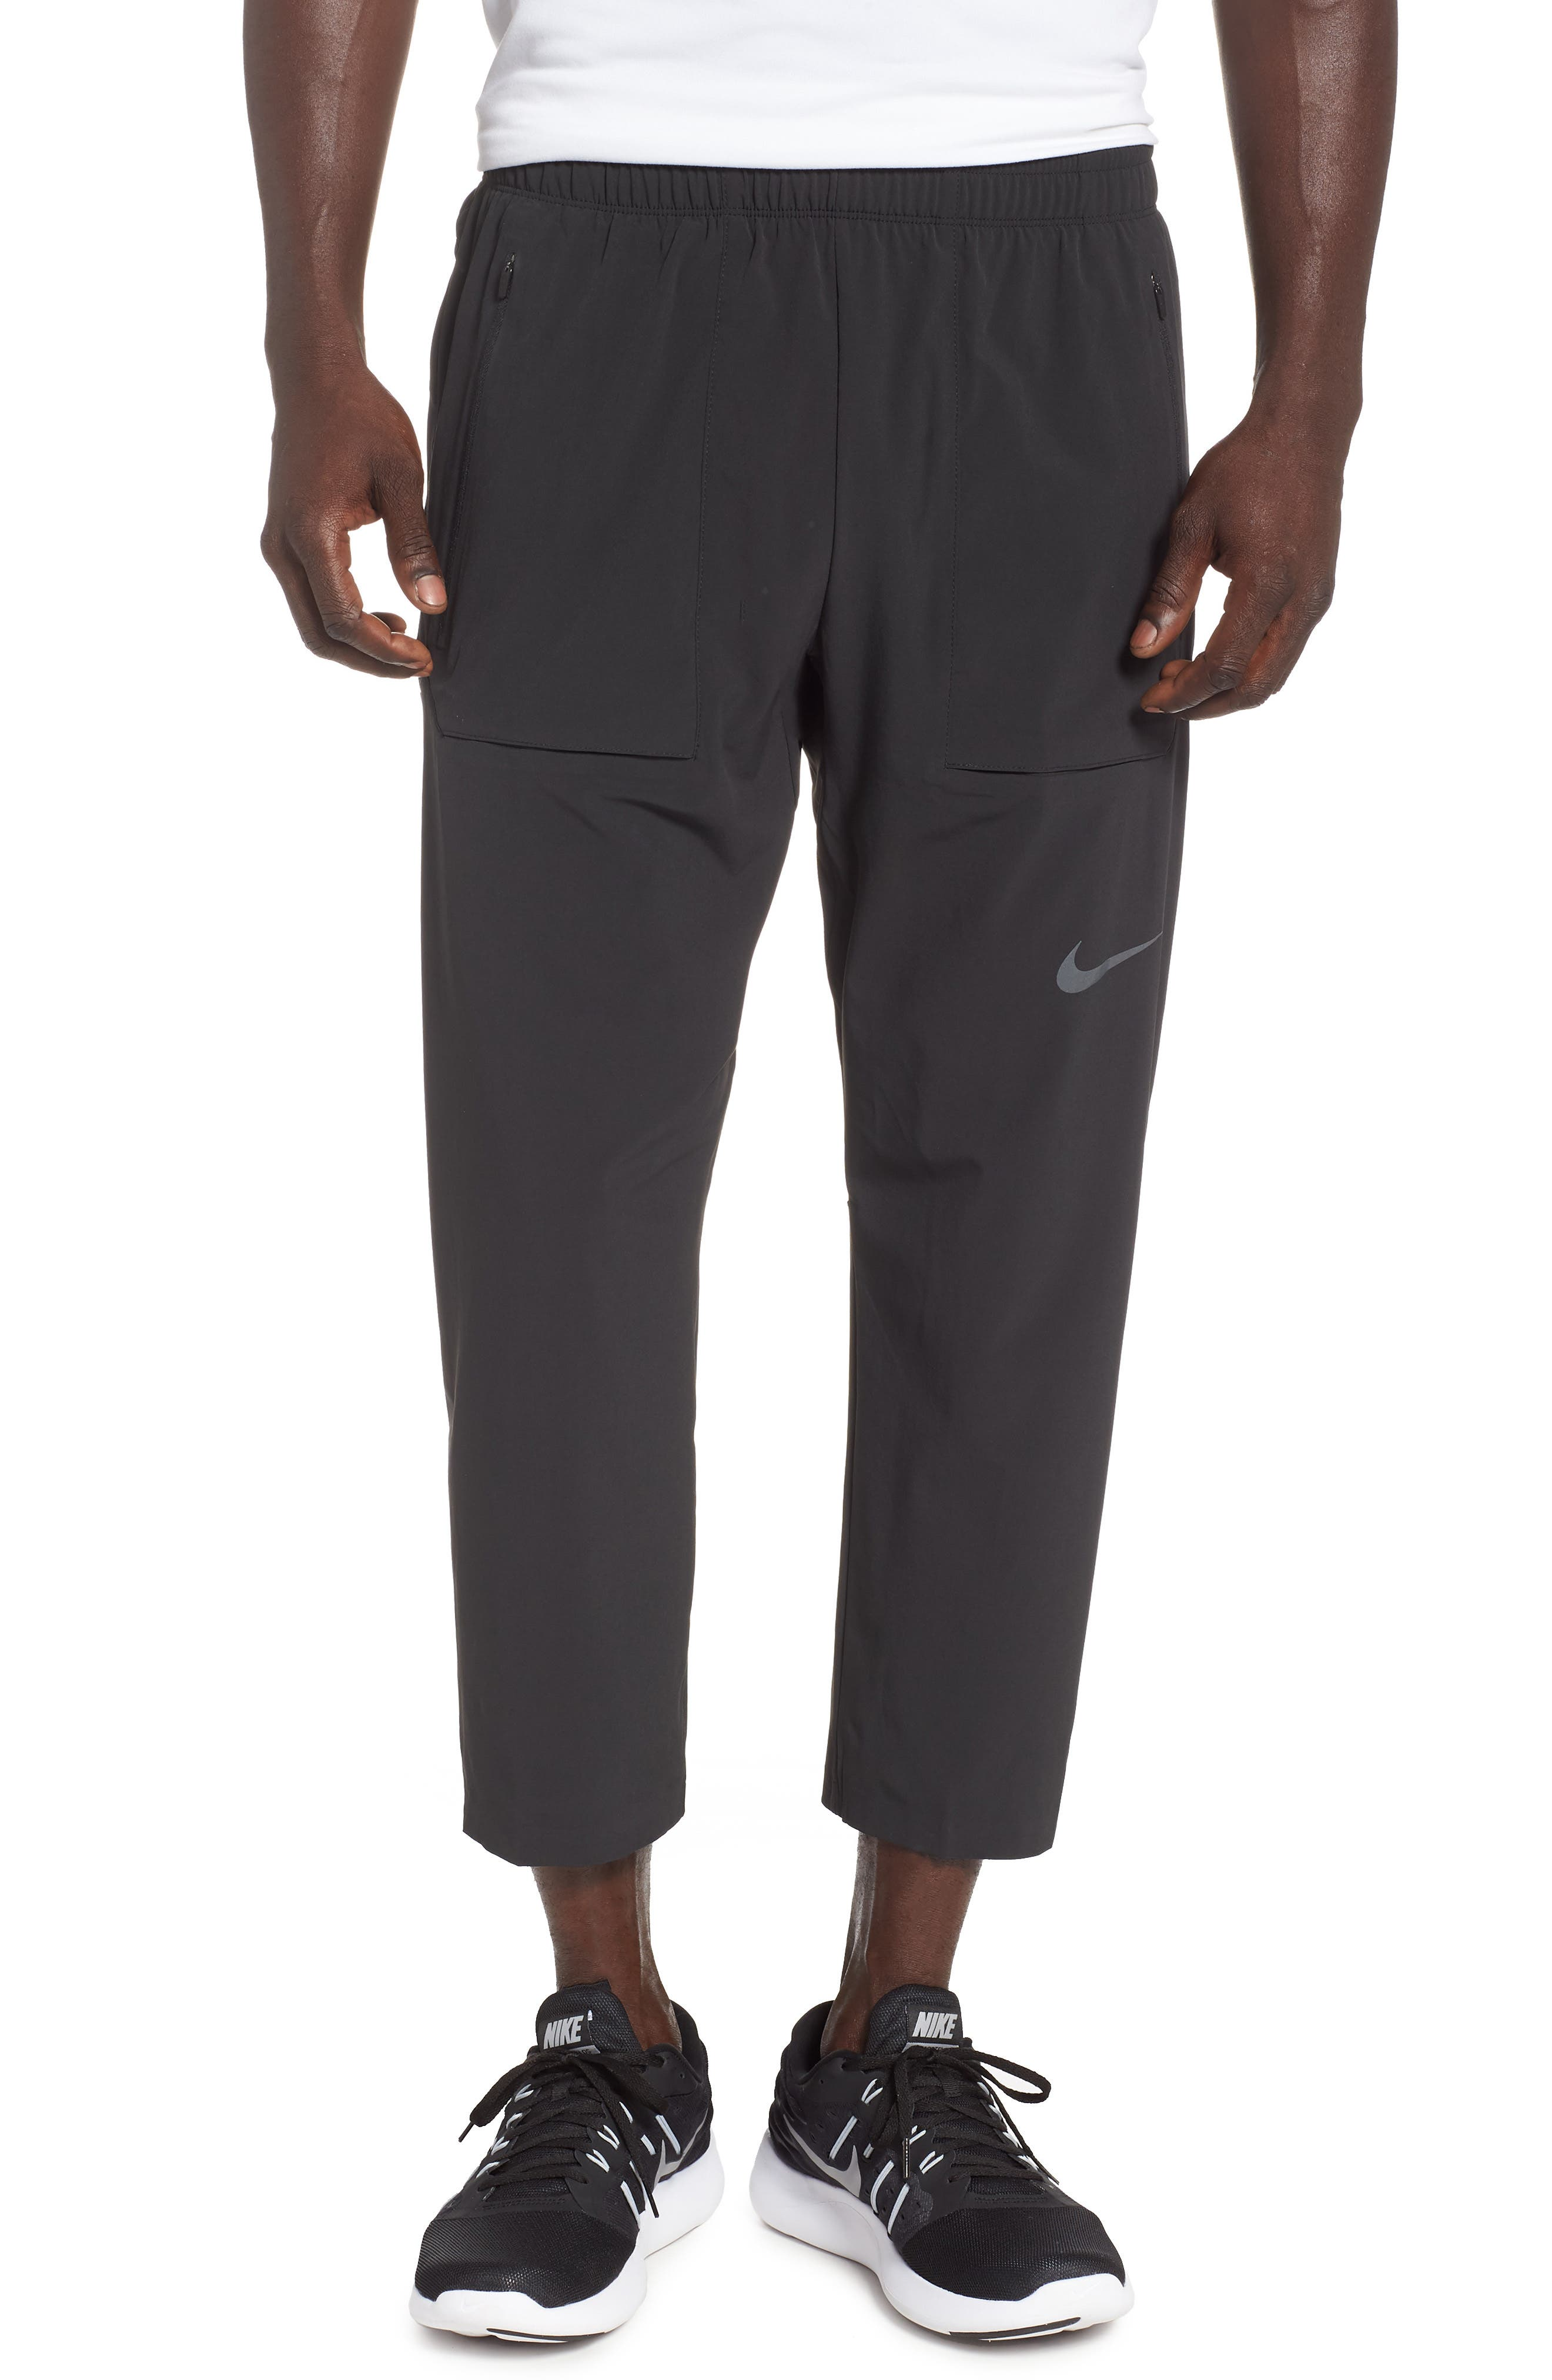 Run Division Running Pants,                         Main,                         color, BLACK/ BLACK